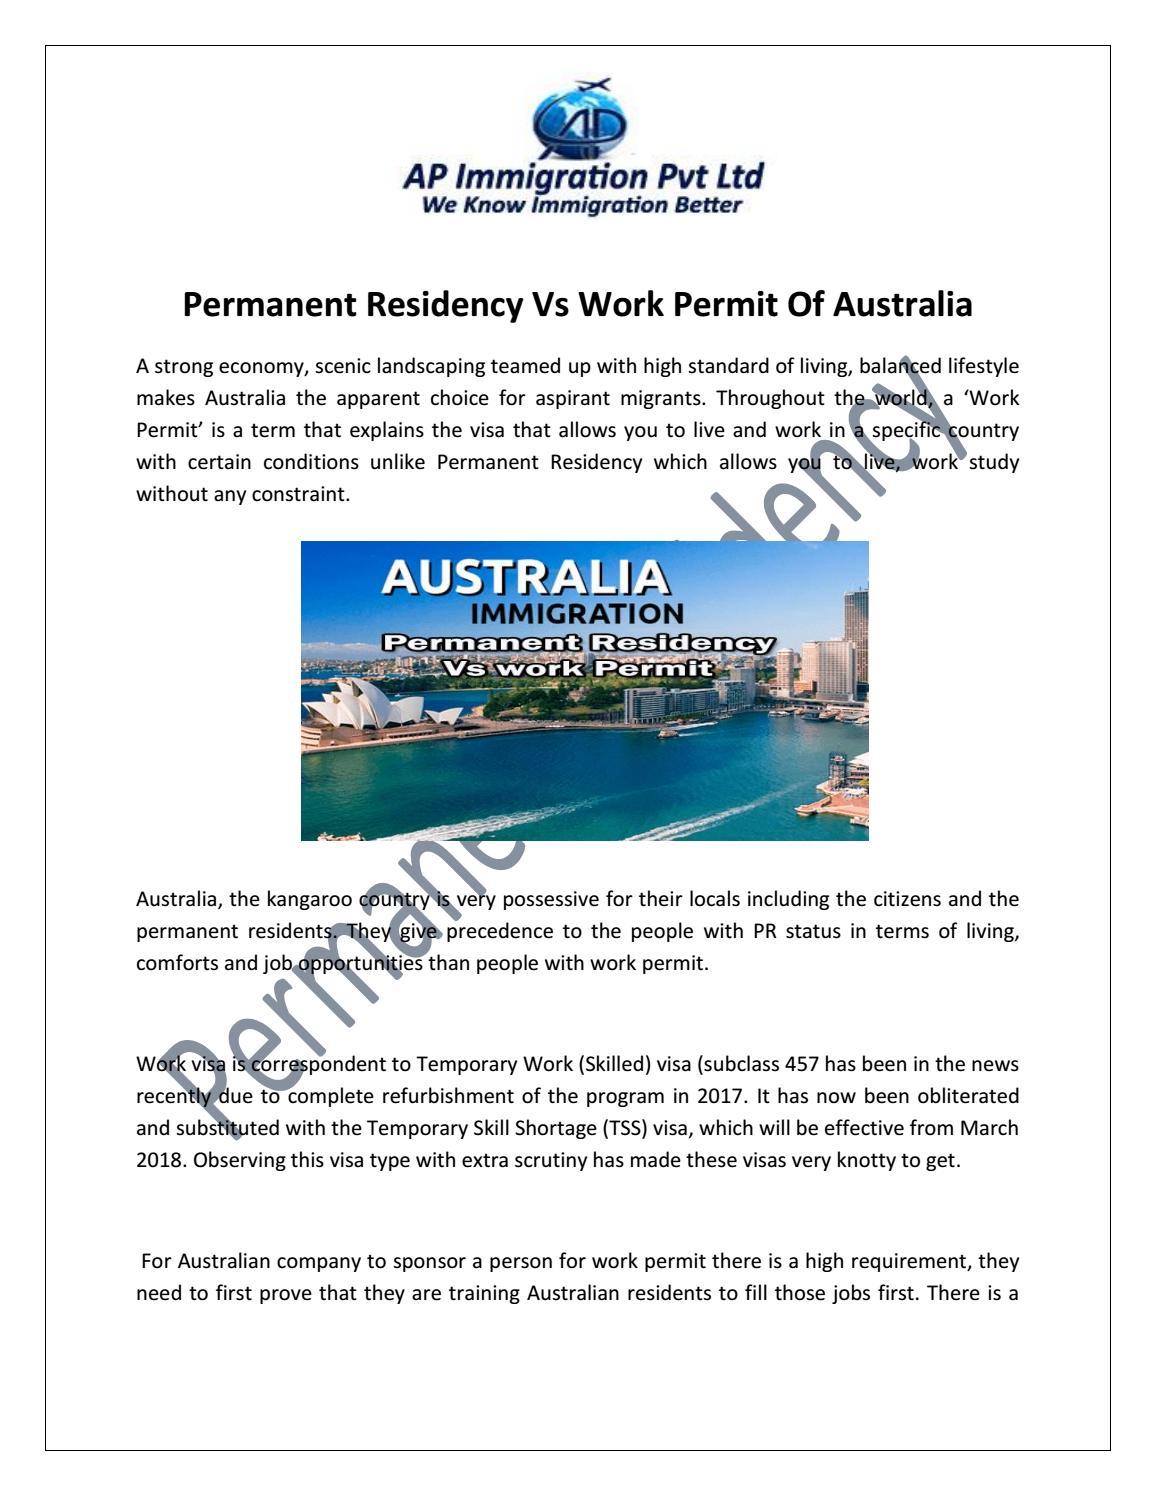 Permanent residency vs work permit of australia by Shweta